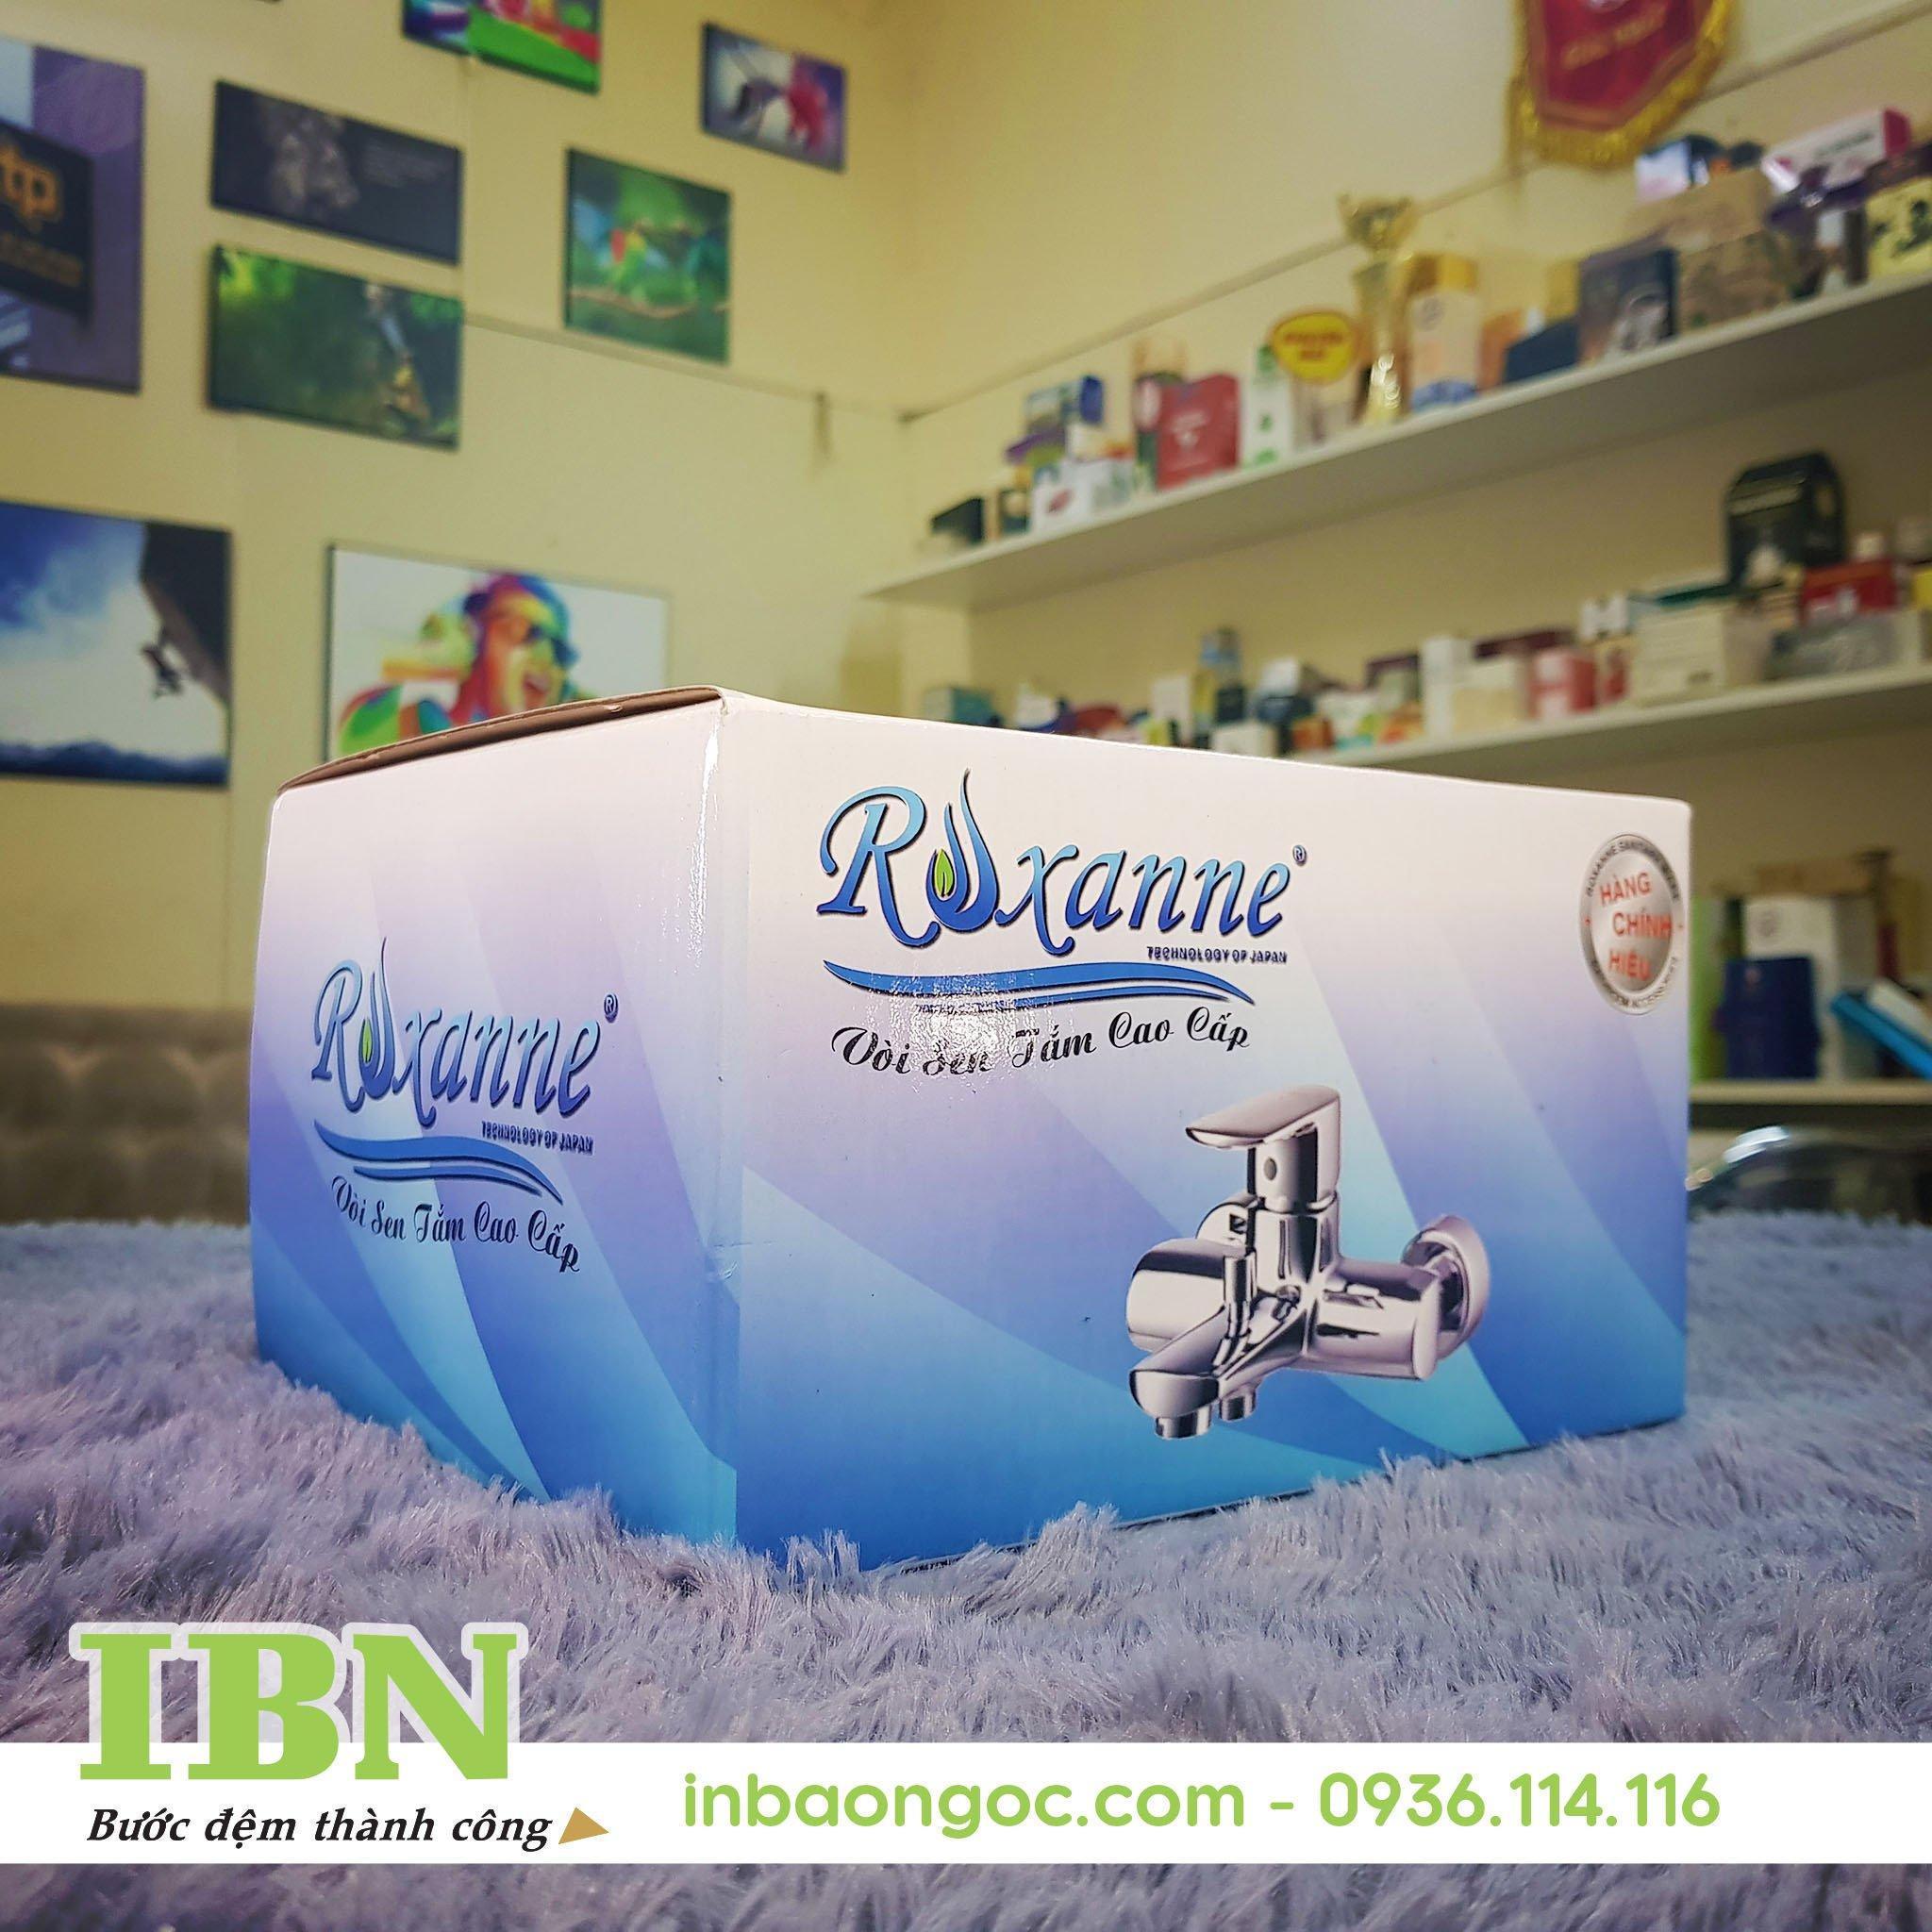 mua thung giay carton o dau tphcm (5)